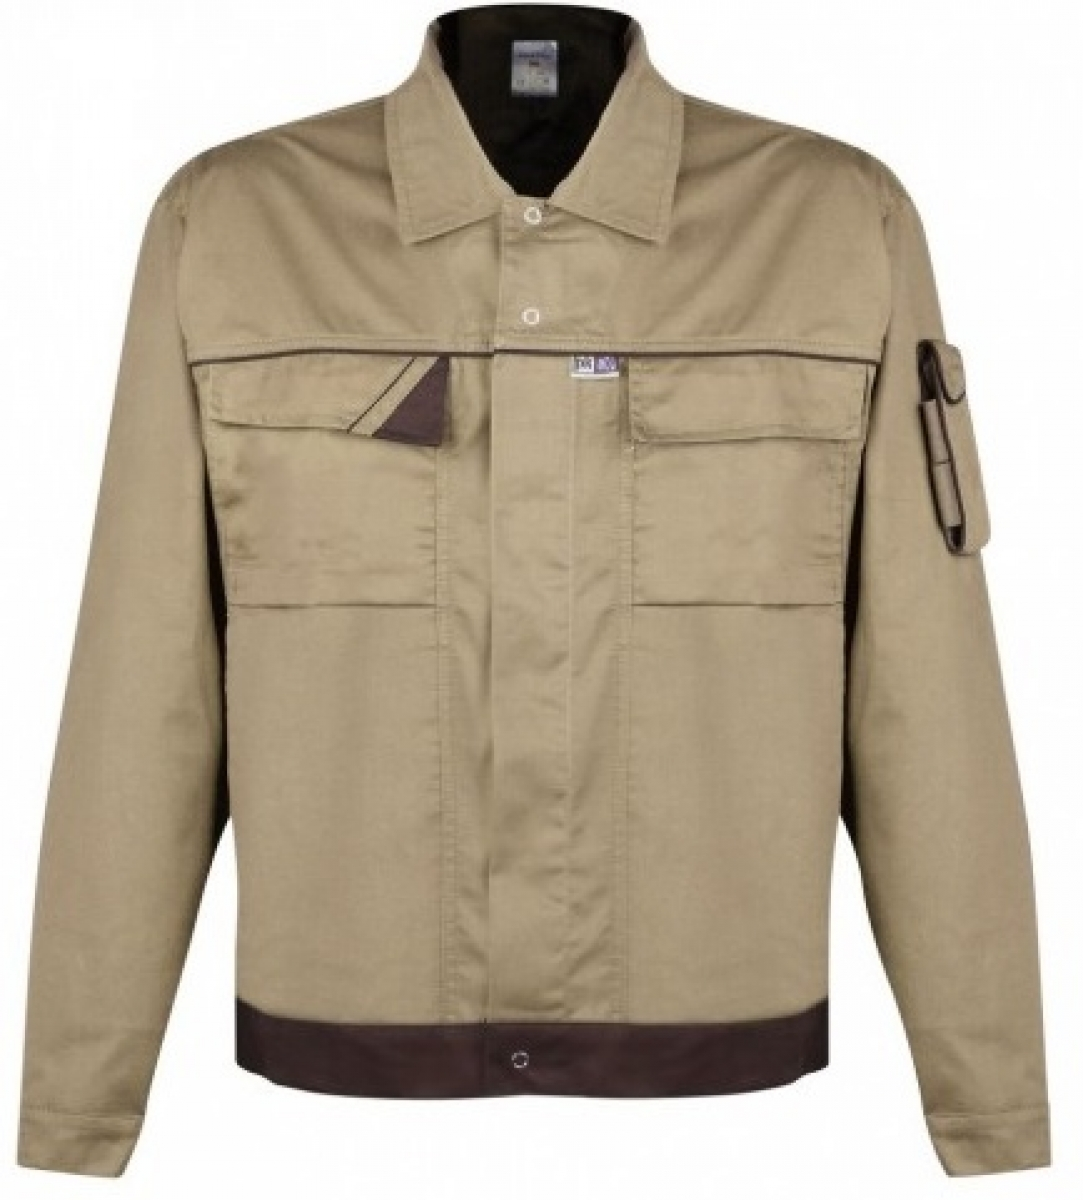 PKA-Arbeits-Berufs-Bund-Jacke, Blouson, Praktika, MG260, sand/braun